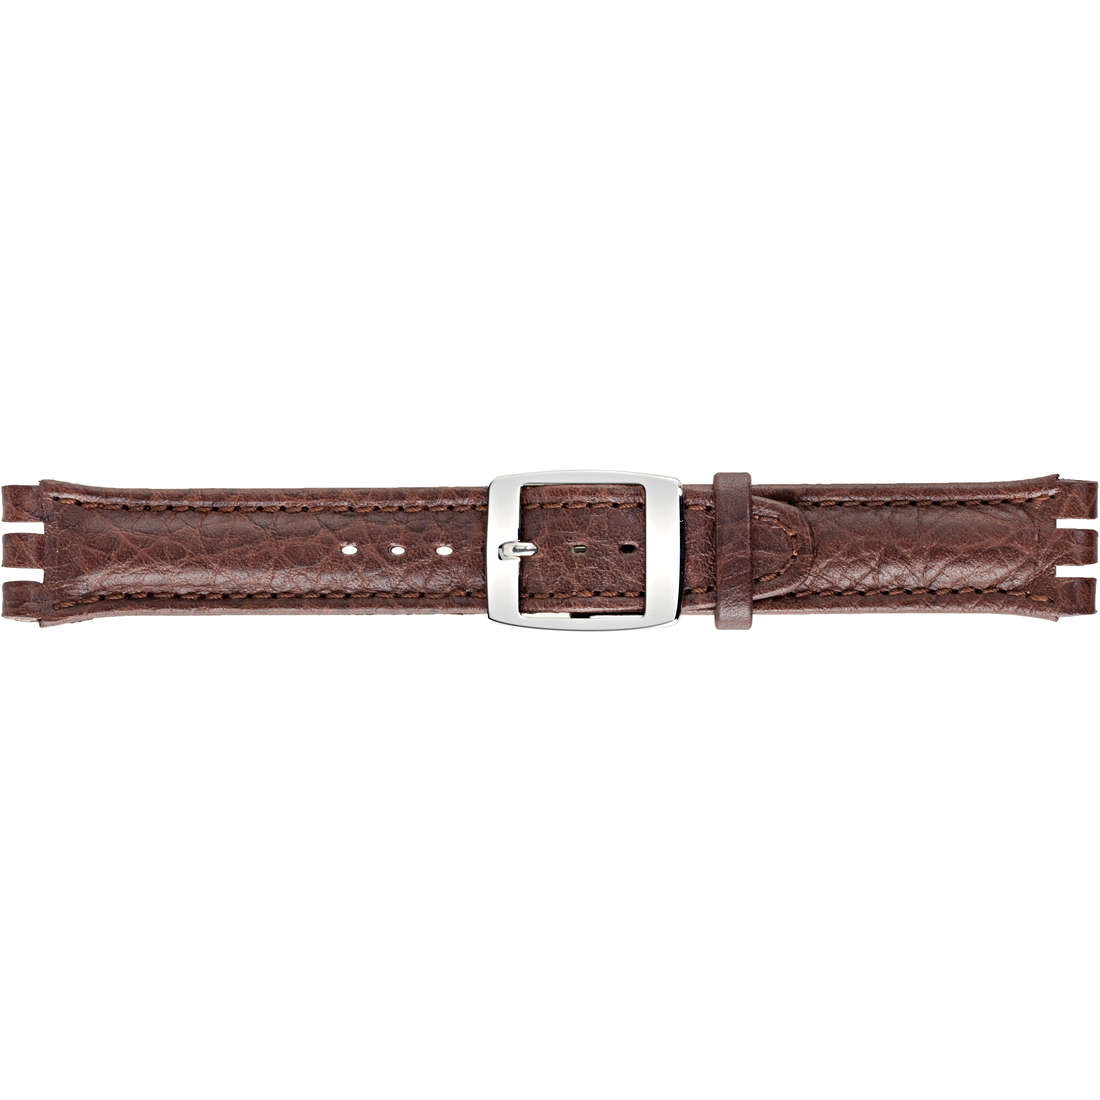 watch watch bands watch straps man Morellato Swatch A01U1840840813MO20